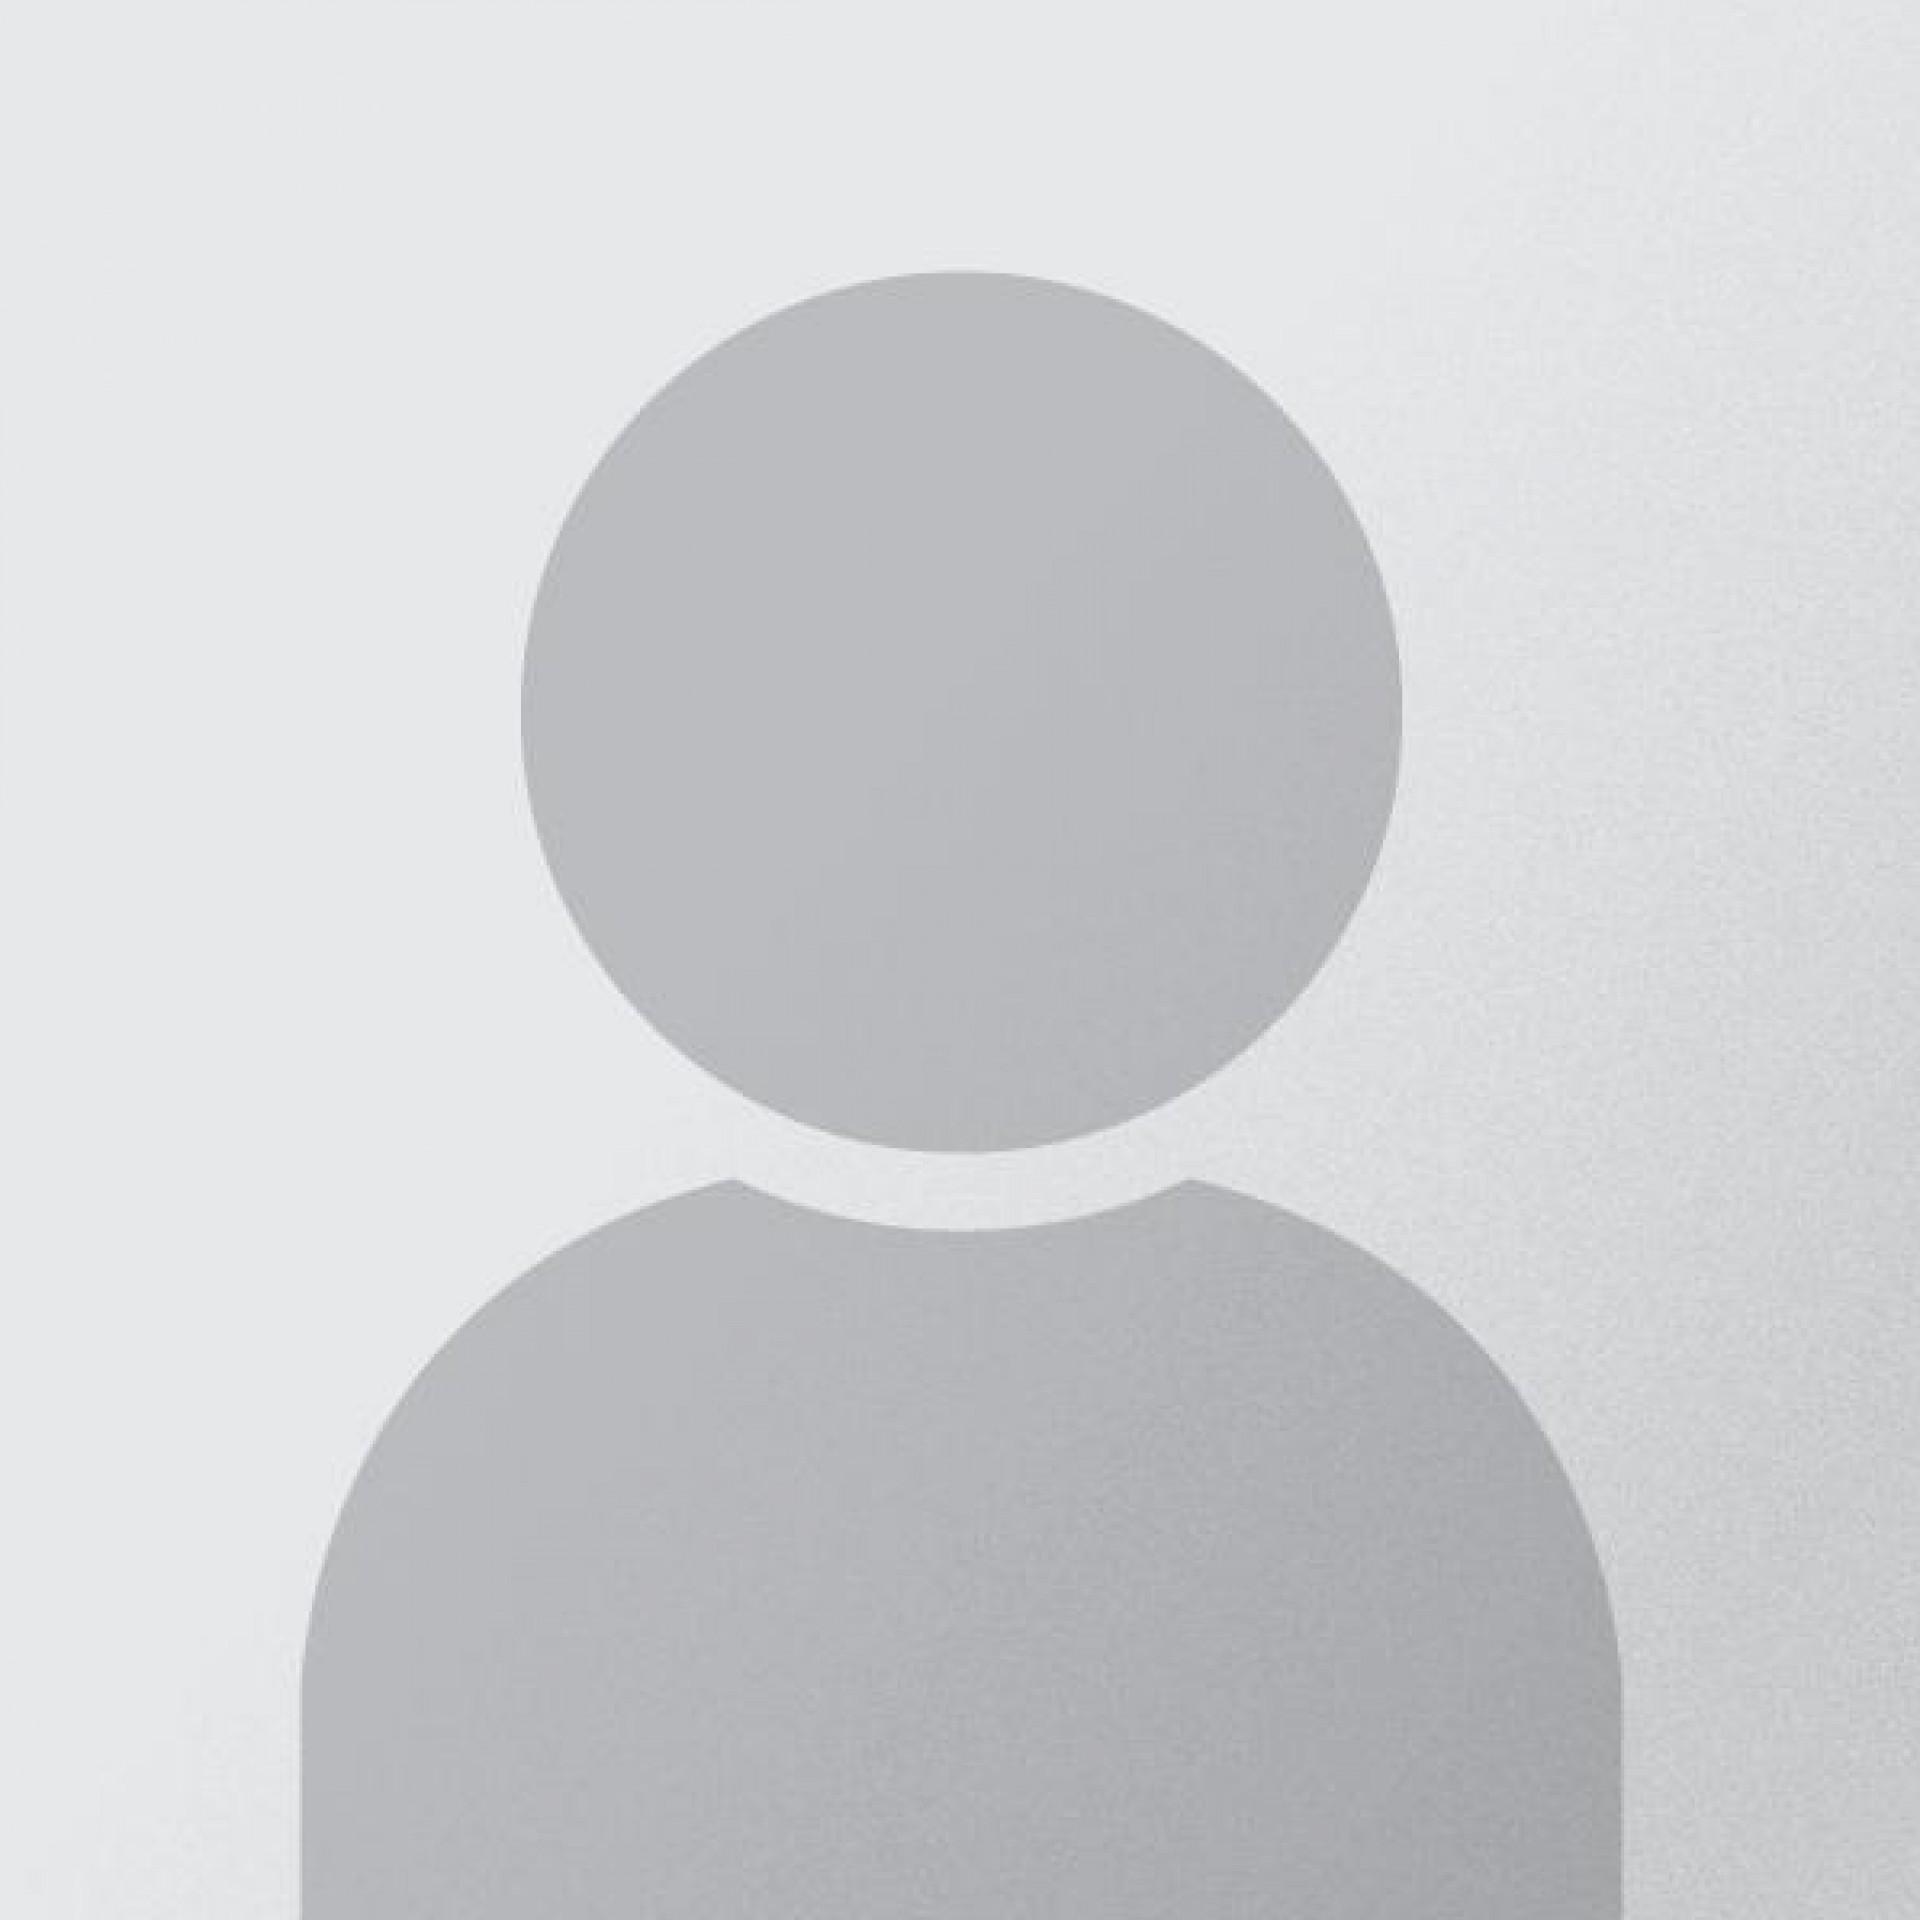 fotografia p021 profilu 0102NBQBV4